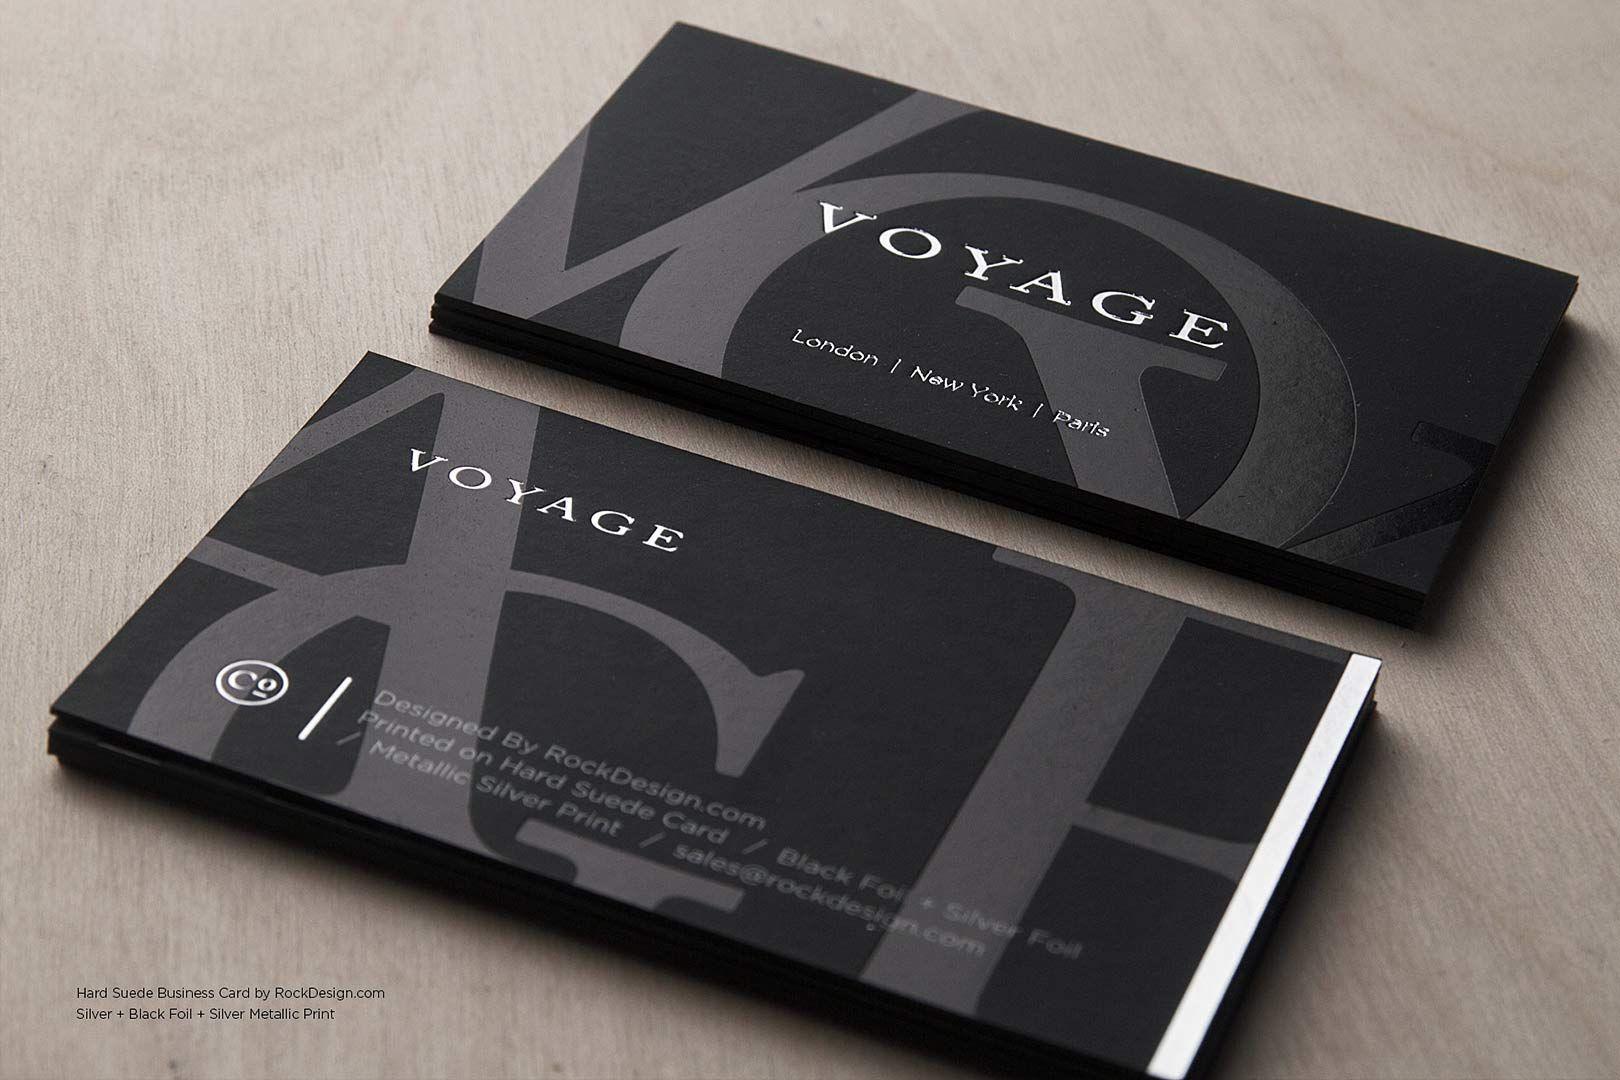 Hard Suede Business Card Design 10 Business Pinterest Luxury